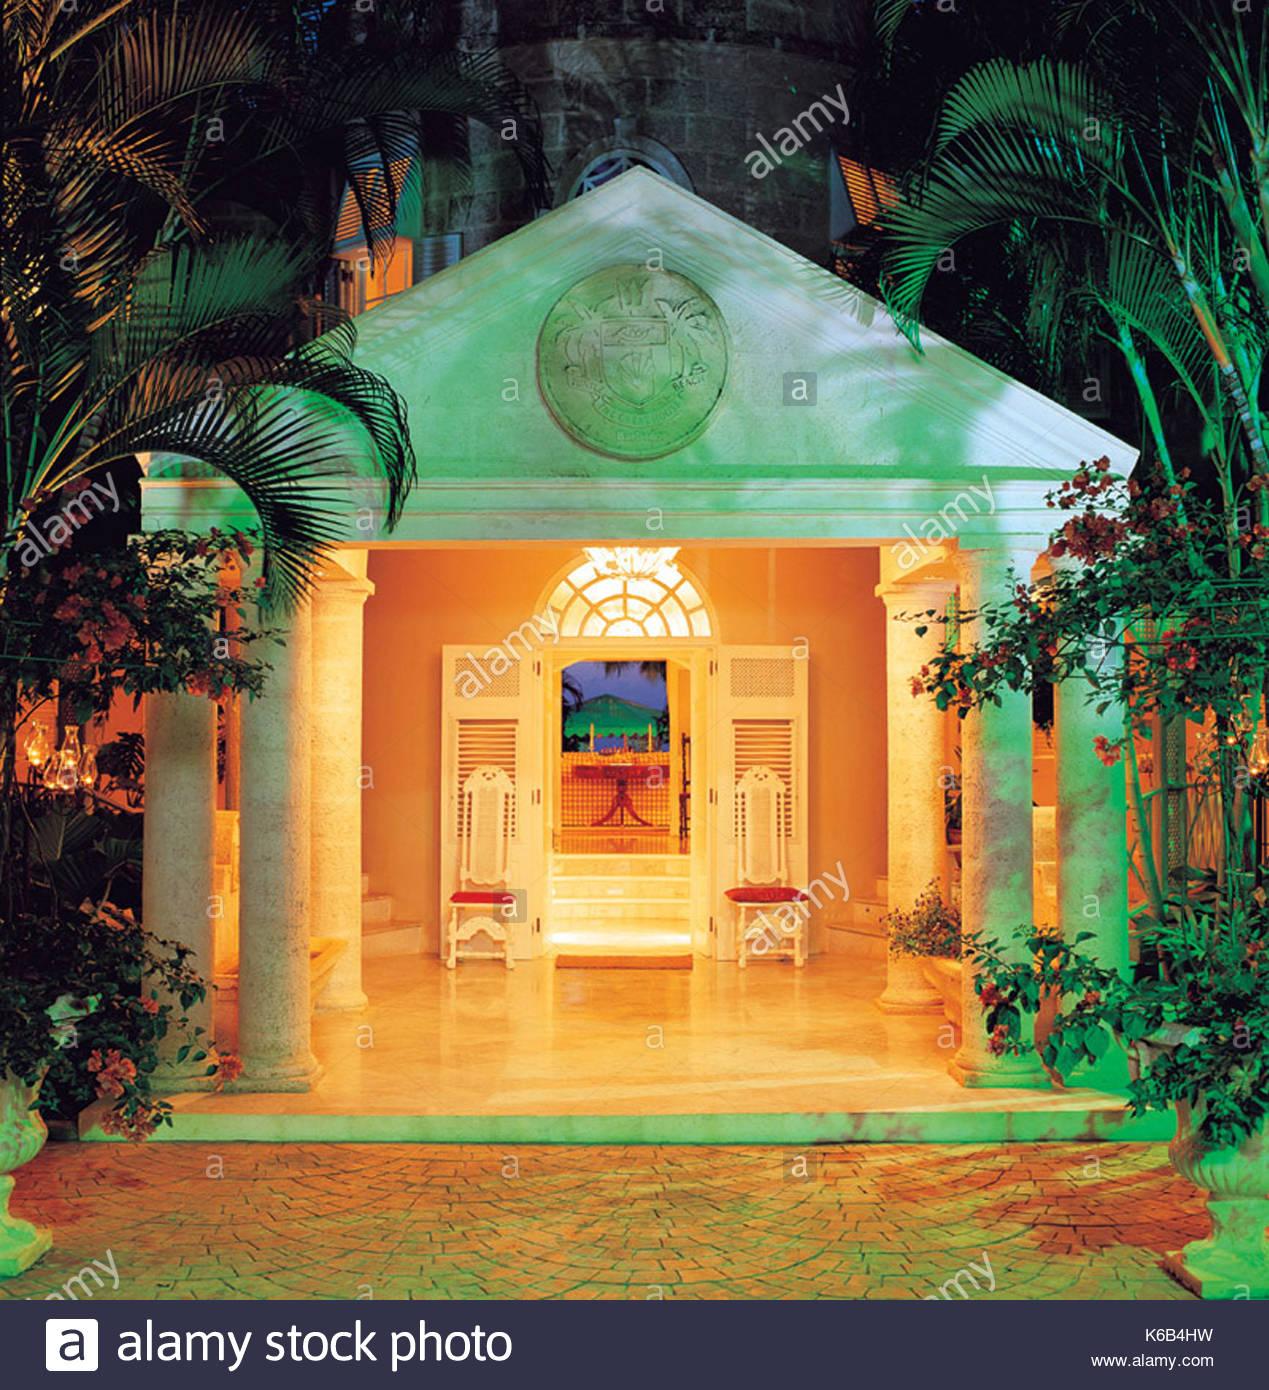 Wedding Venue Turtle Beach Great House Venues For Kian Egan And